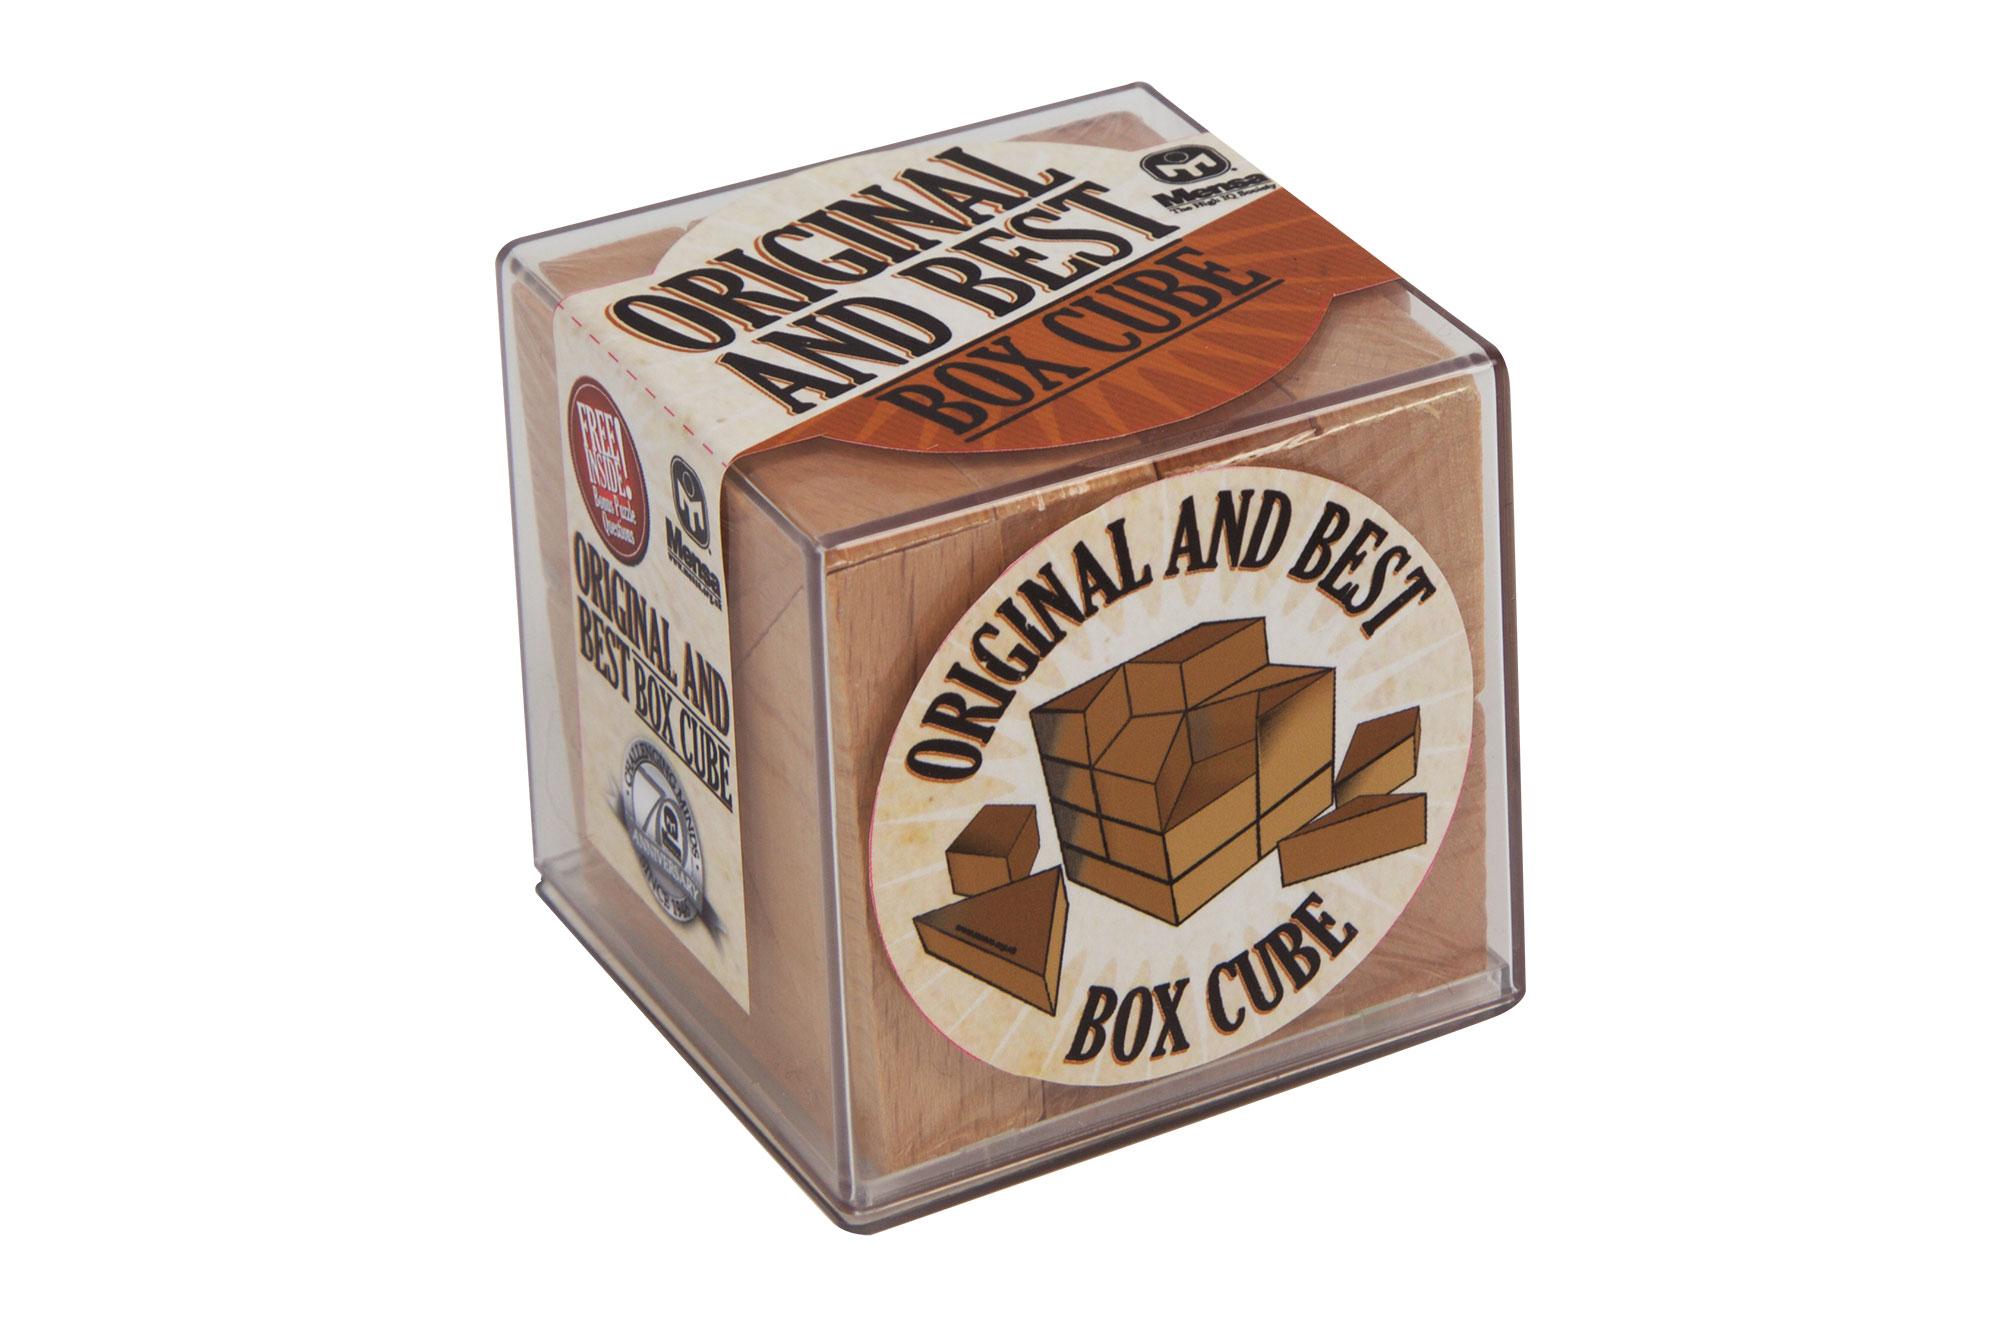 mensa box cube instructions